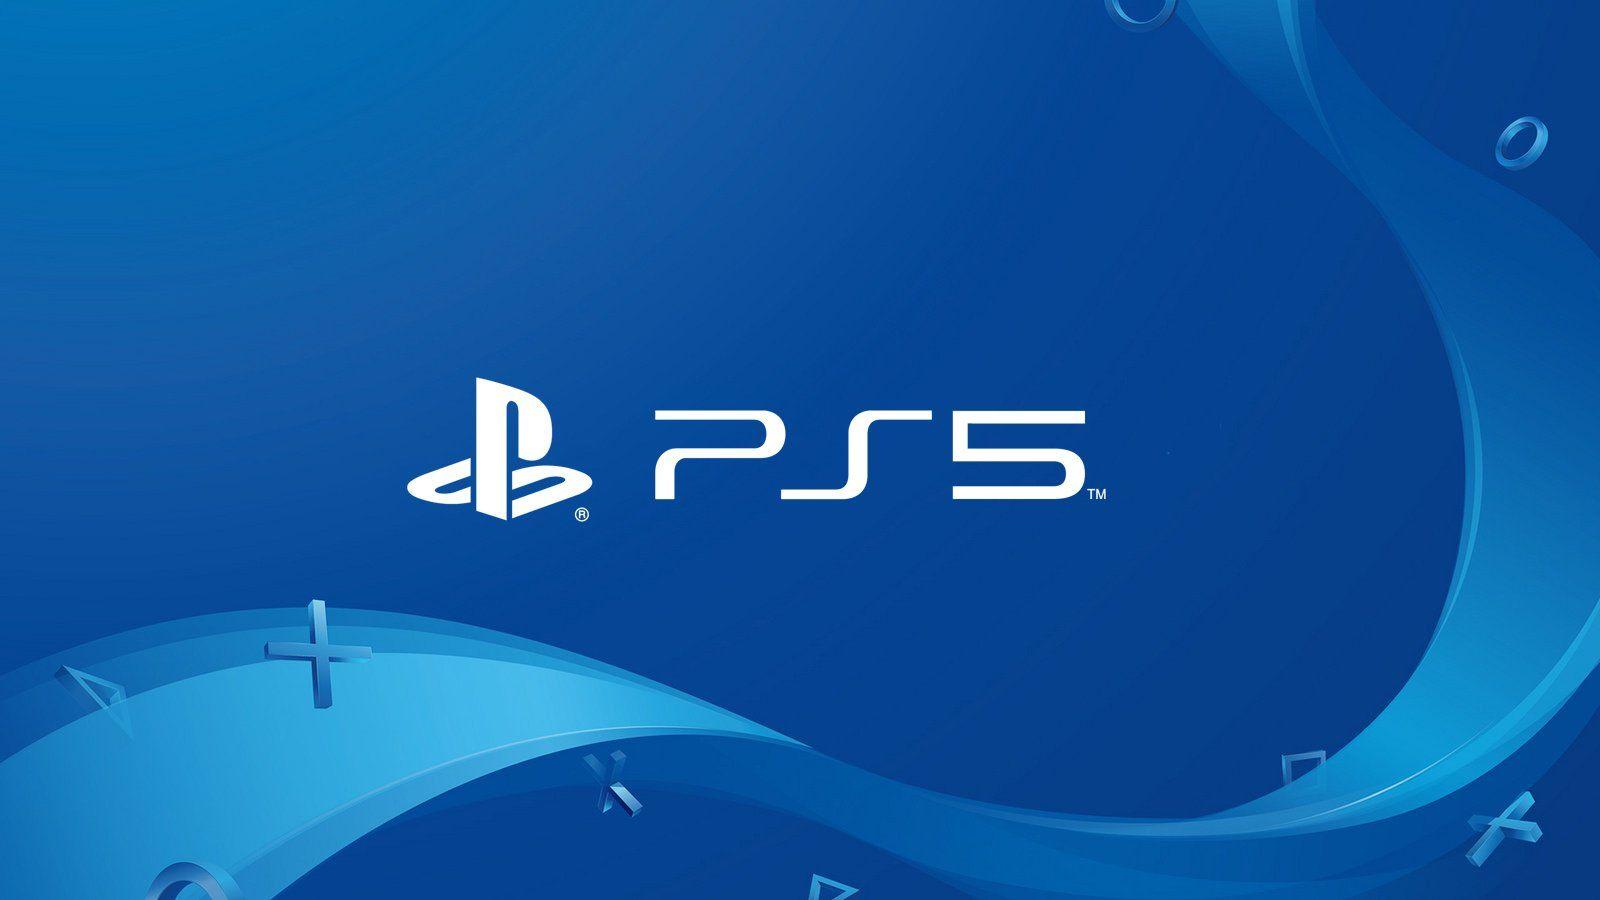 Playstation 5 preturi lansare